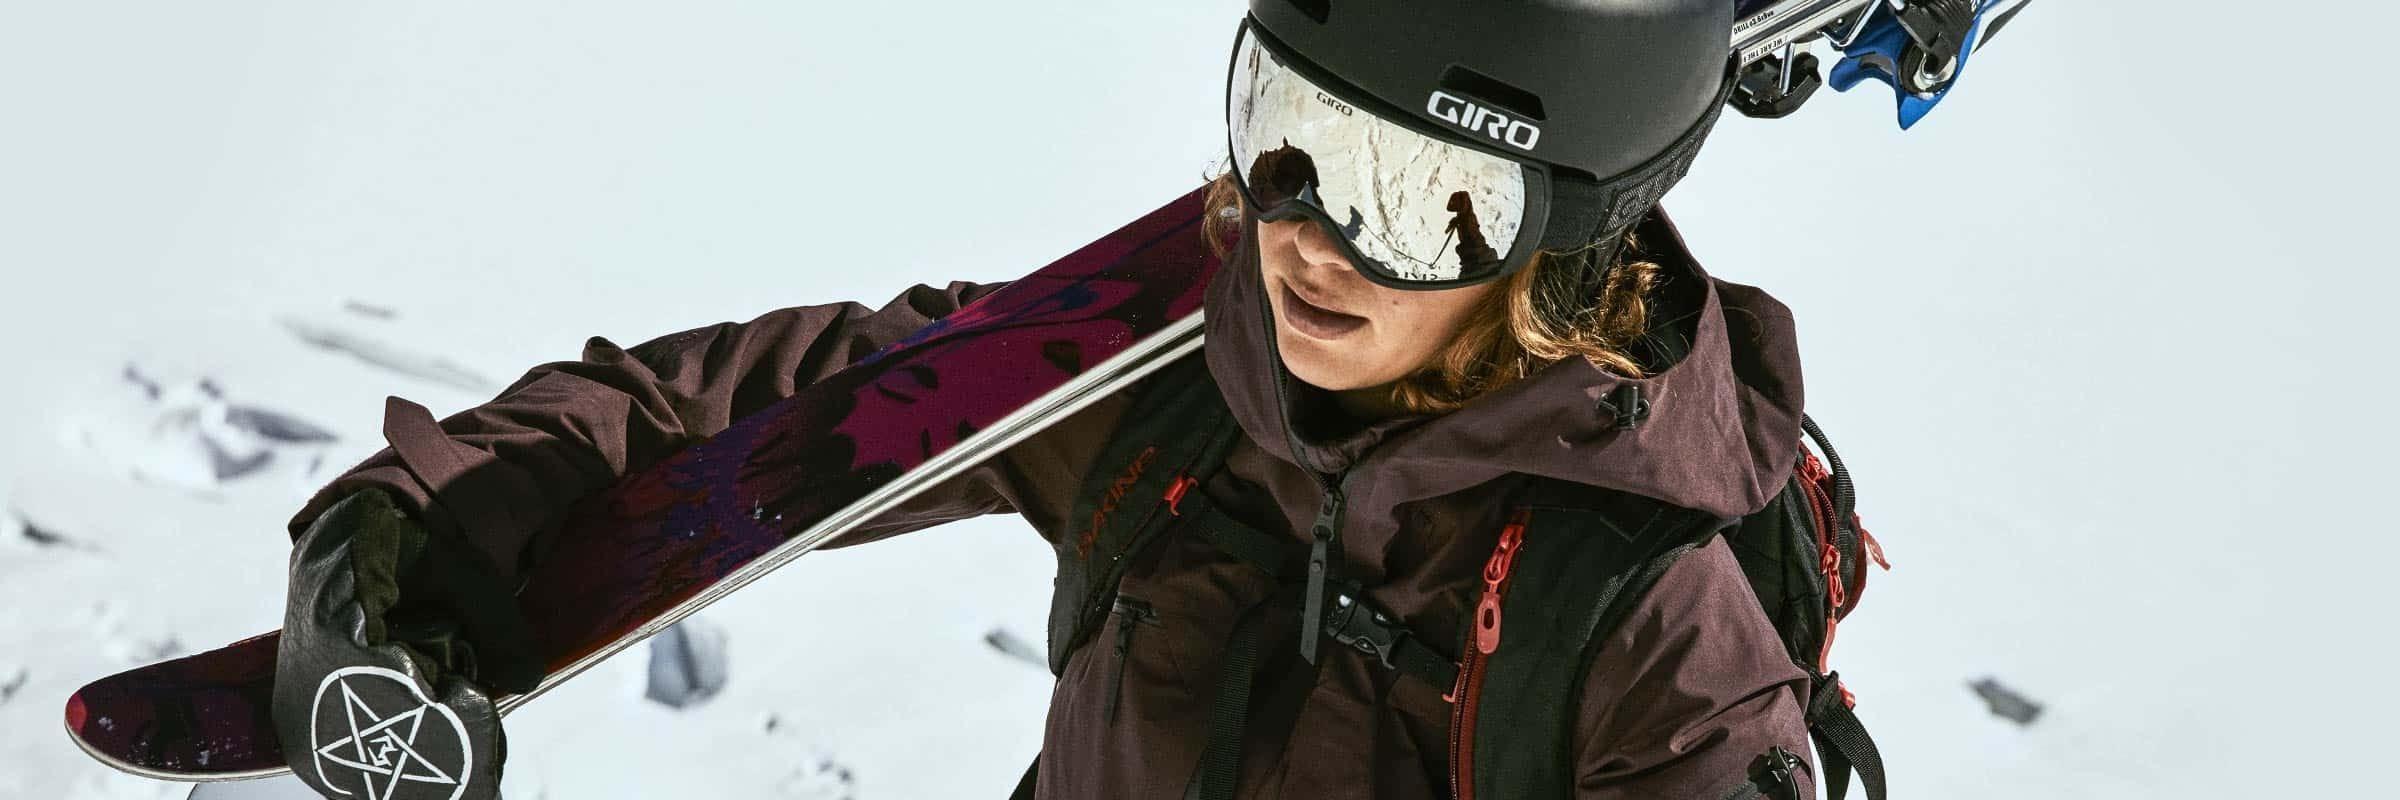 Peak Performance, Ski & Snowboard. Discover the 2018 Peak Performance Ski Kits